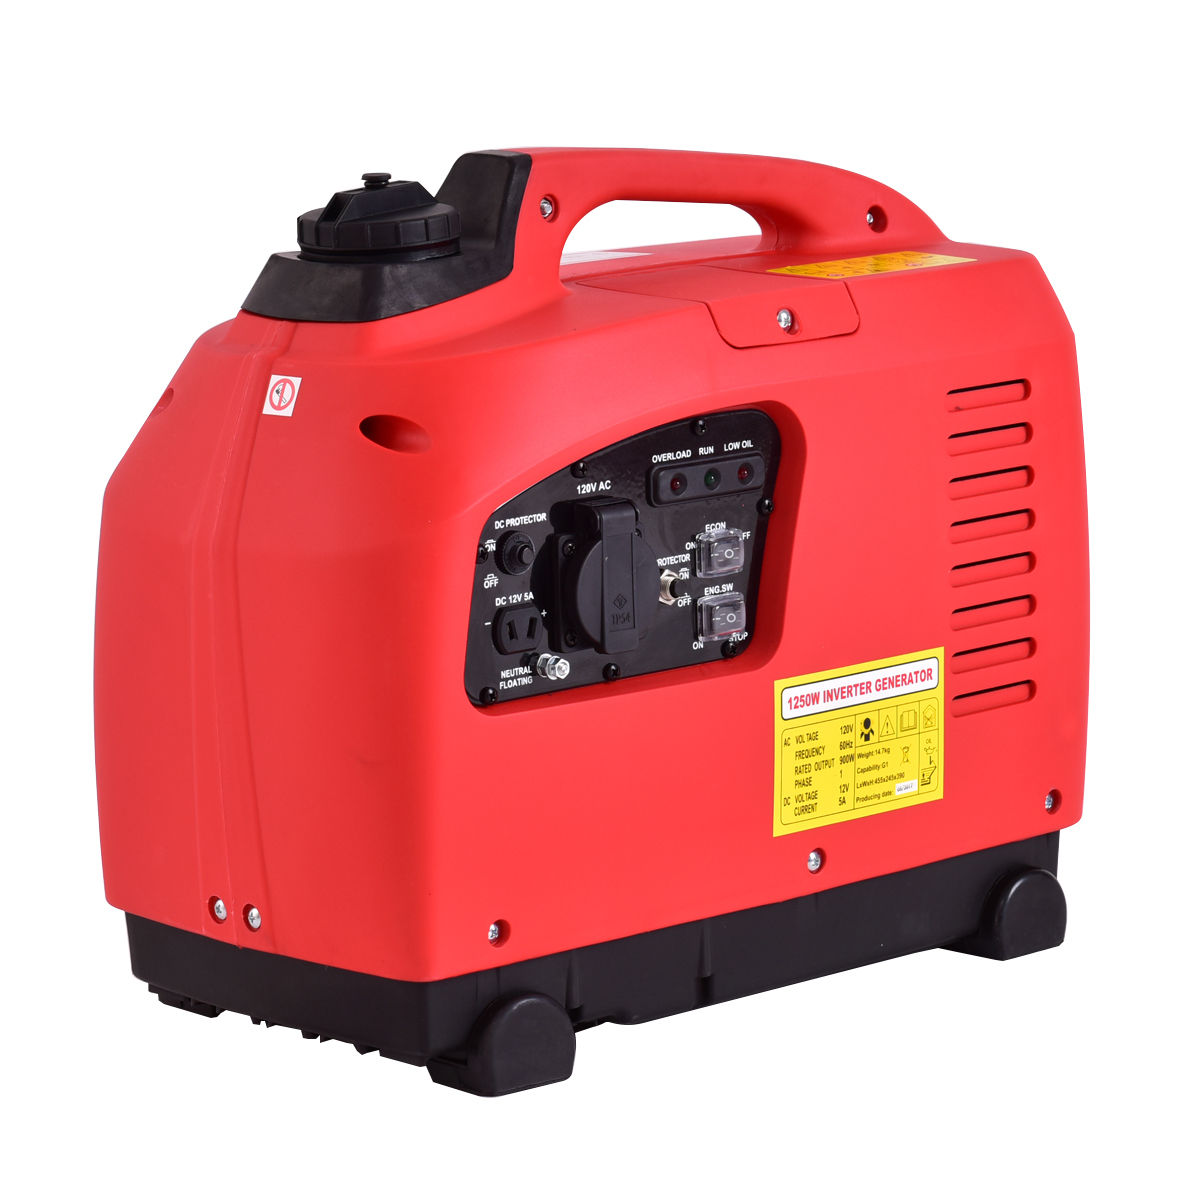 Costway Portable 1250W Digital Inverter Generator 4 Stroke 53cc Single Cylinder Red